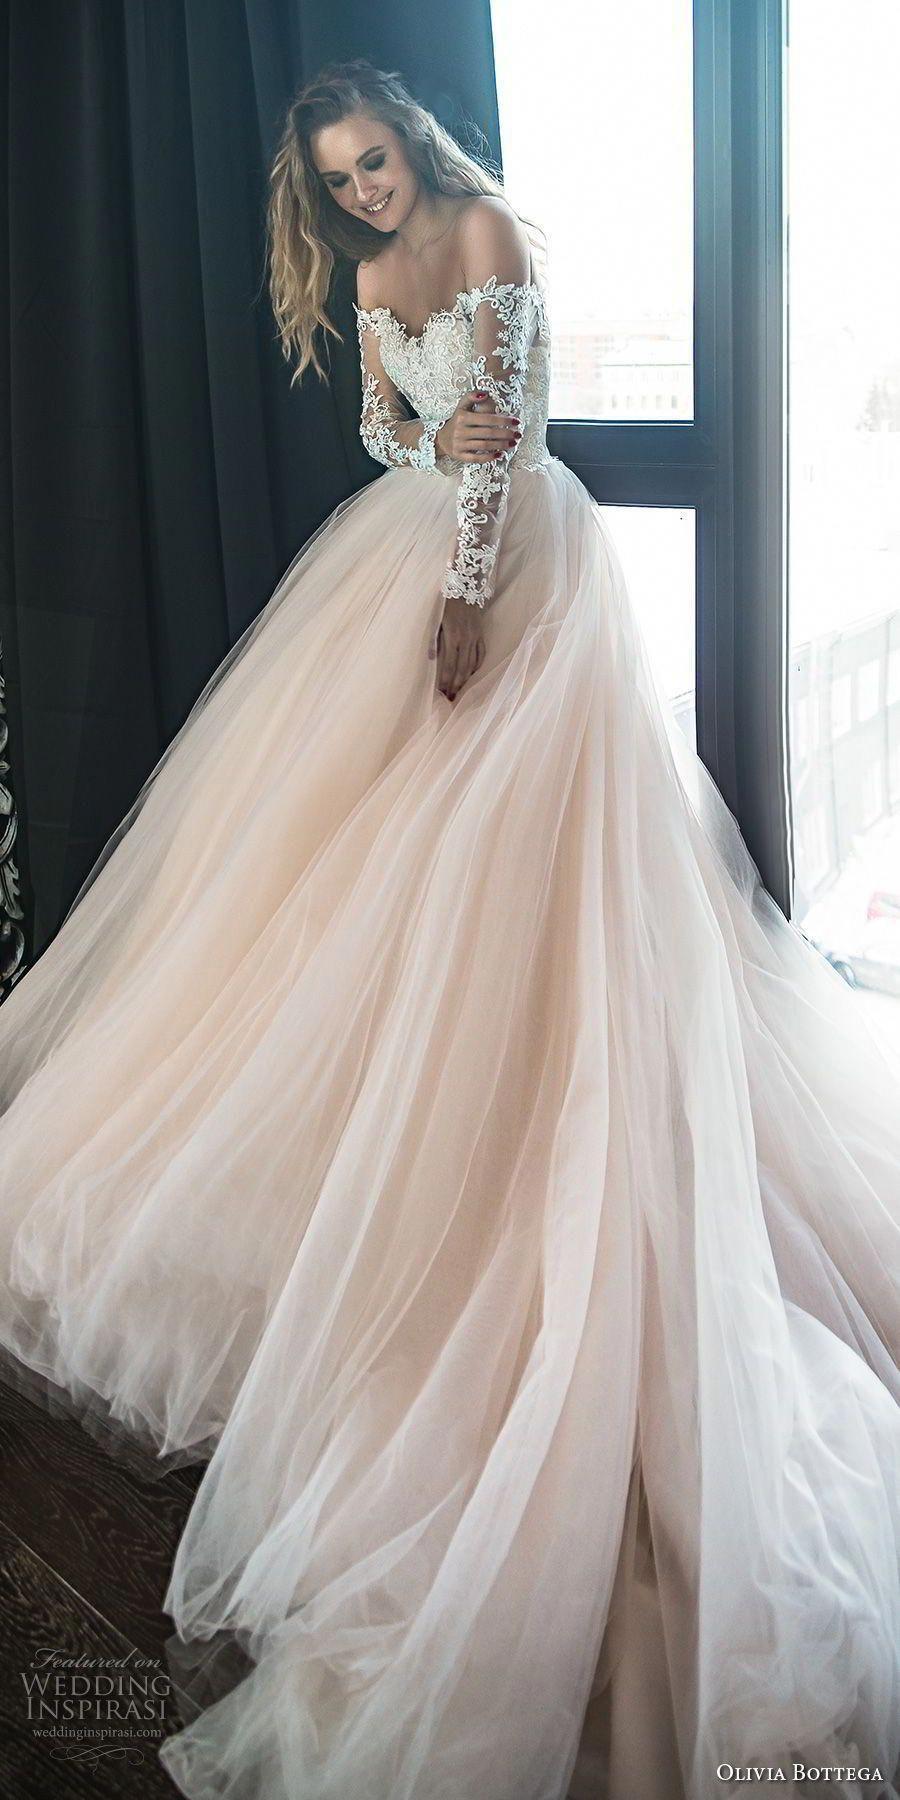 812297b3d12 olivia bottega 2018 bridal long sleeves off the shoulder sweetheart neckline  heavily embellished bodice princess romantic